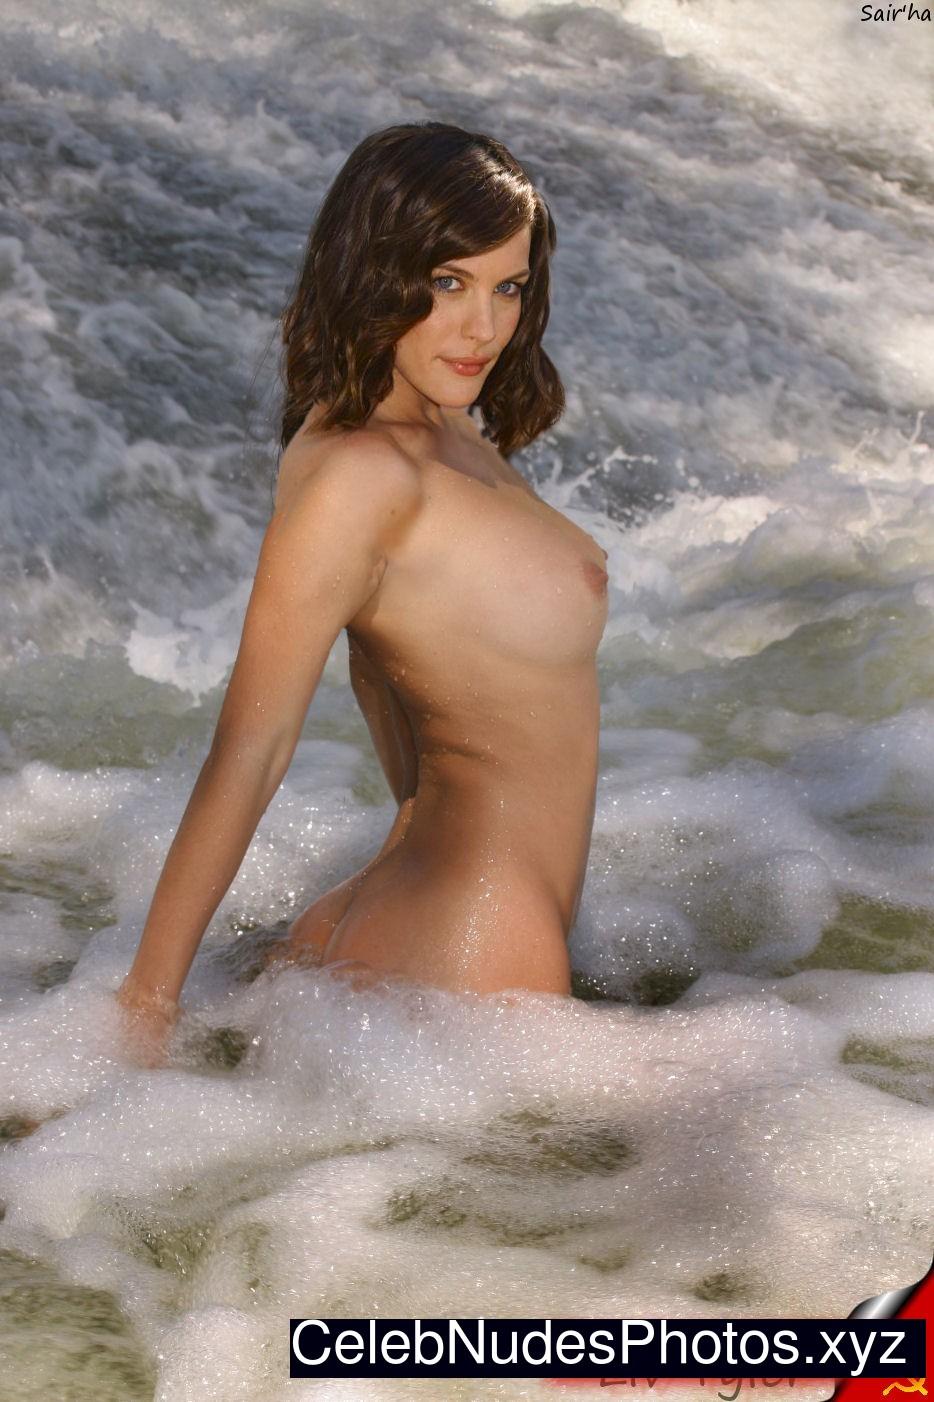 Cecilia Galliano Naked Stunning liv tyler celebrities naked - celeb nudes photos